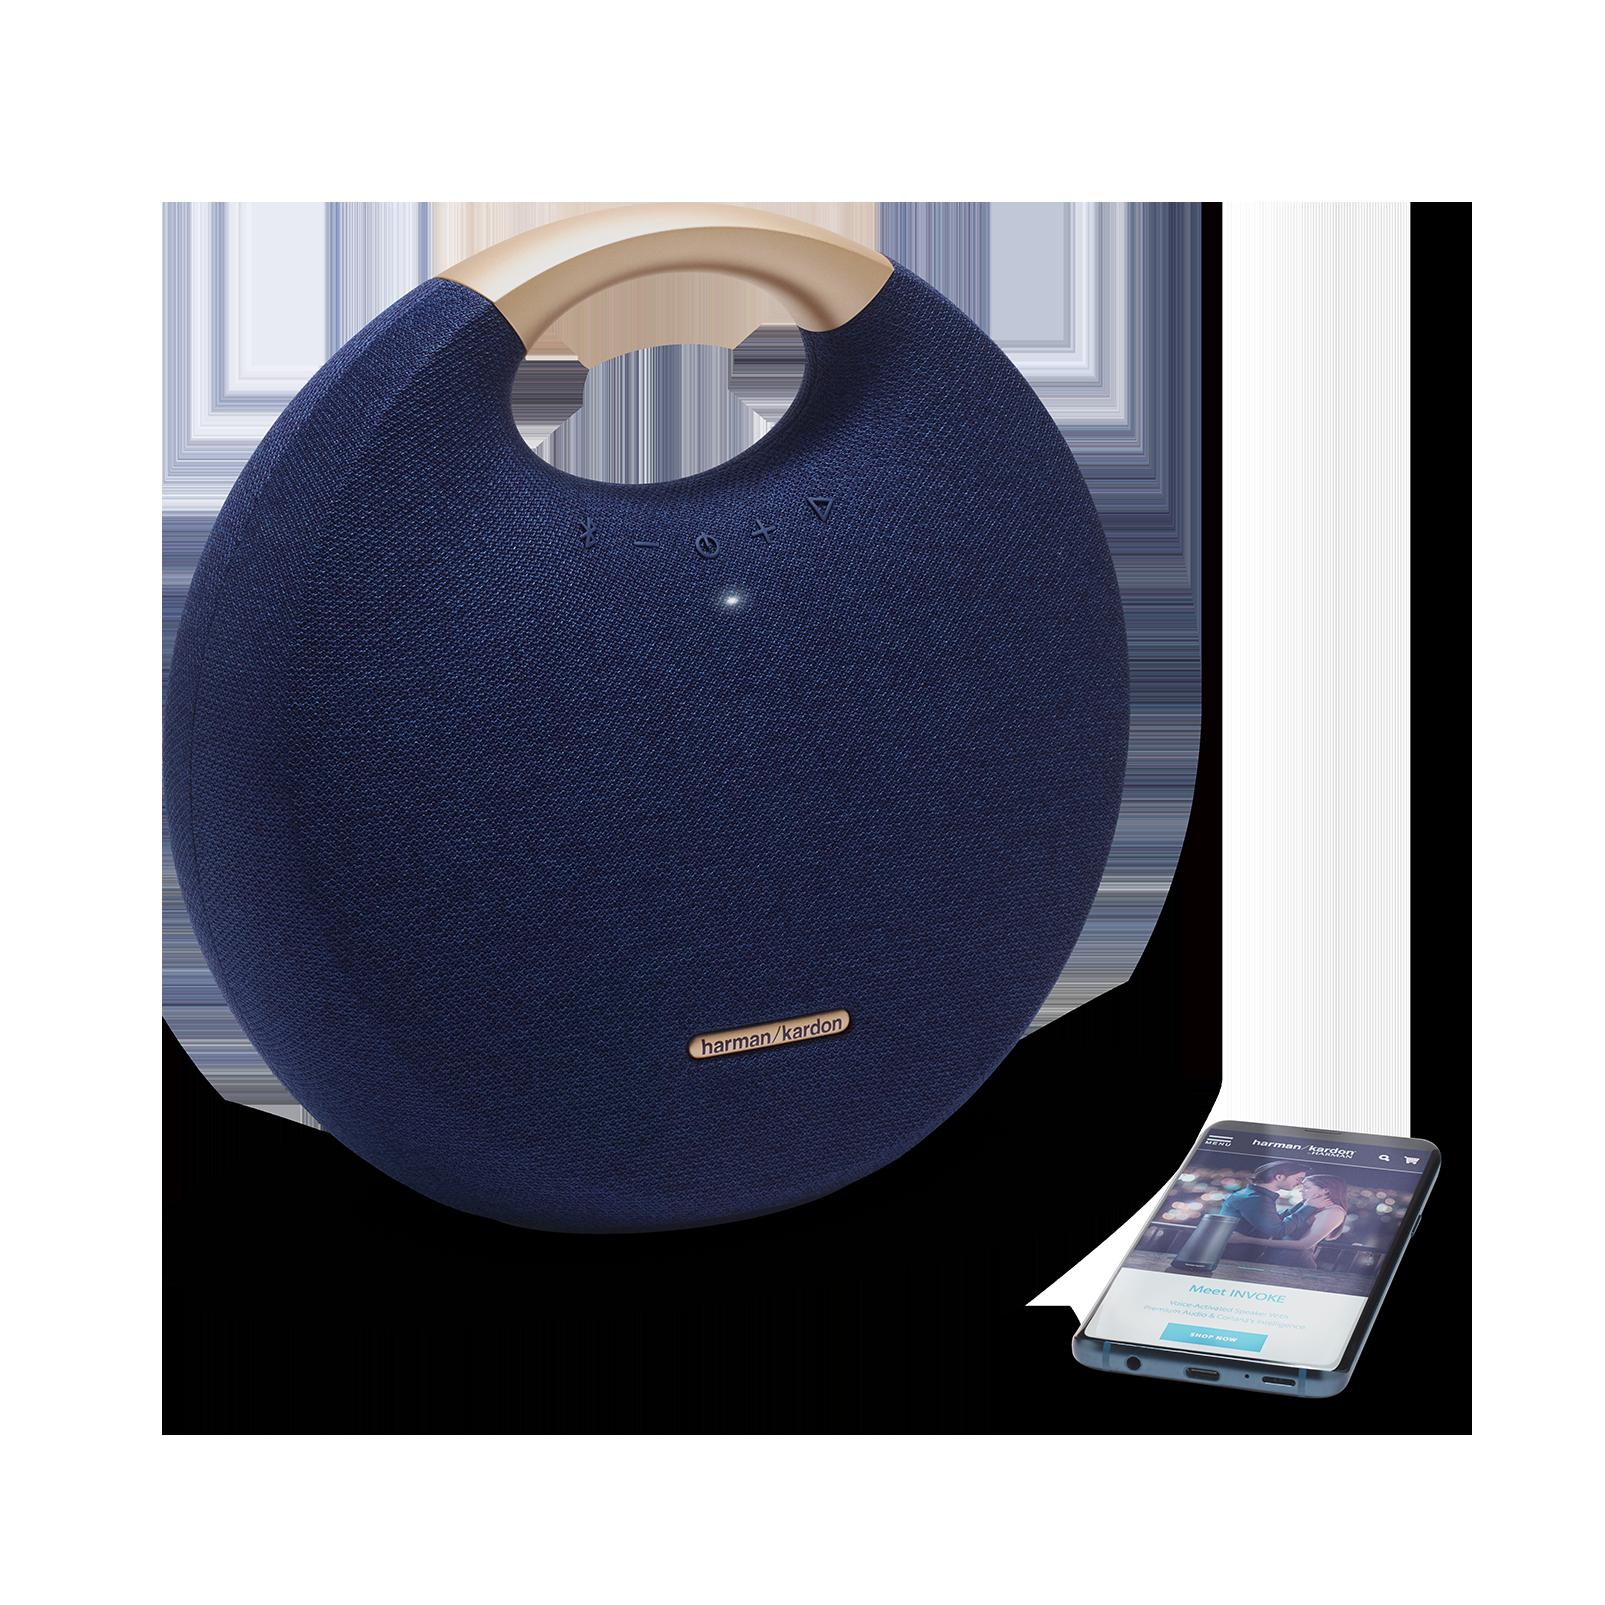 Onyx Studio 5 - Blue - Portable Bluetooth Speaker - Detailshot 1